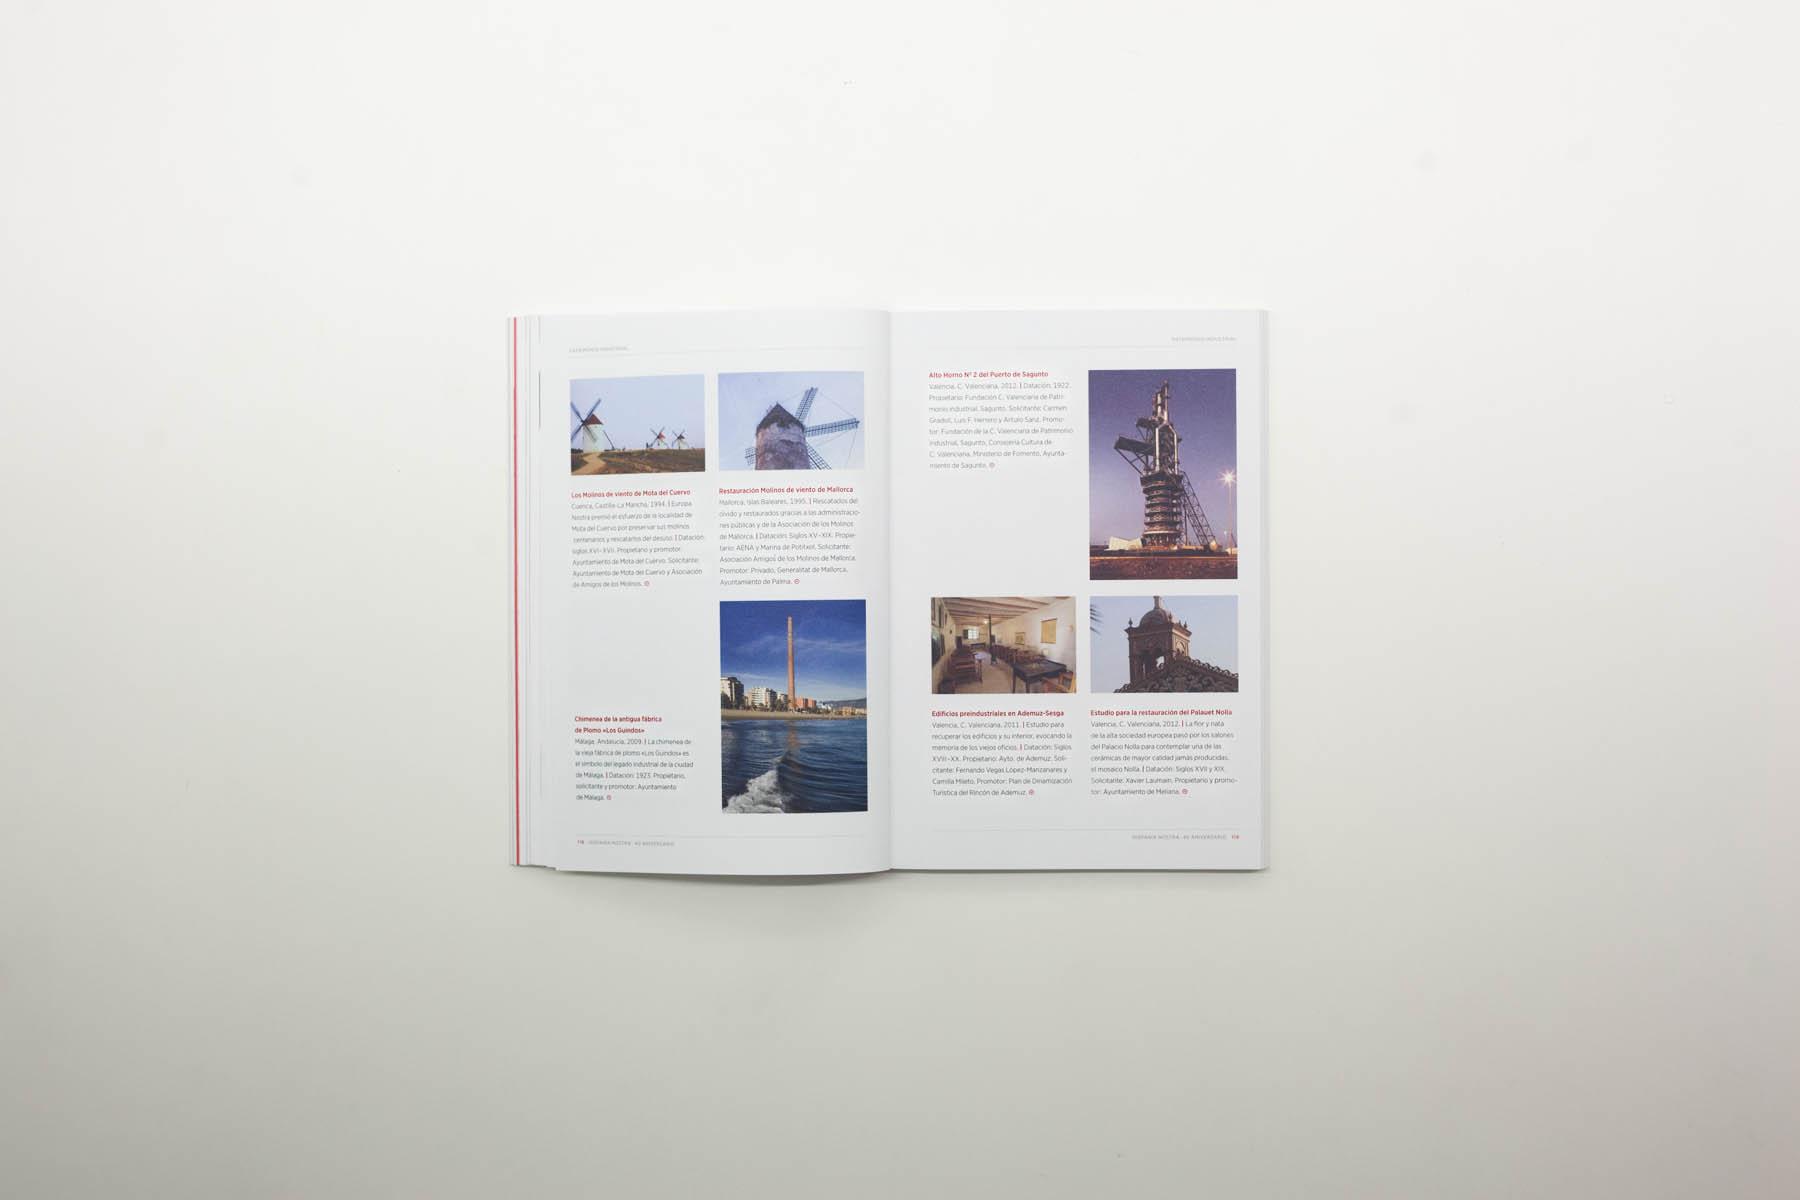 hispania_nostra_catalogo_6